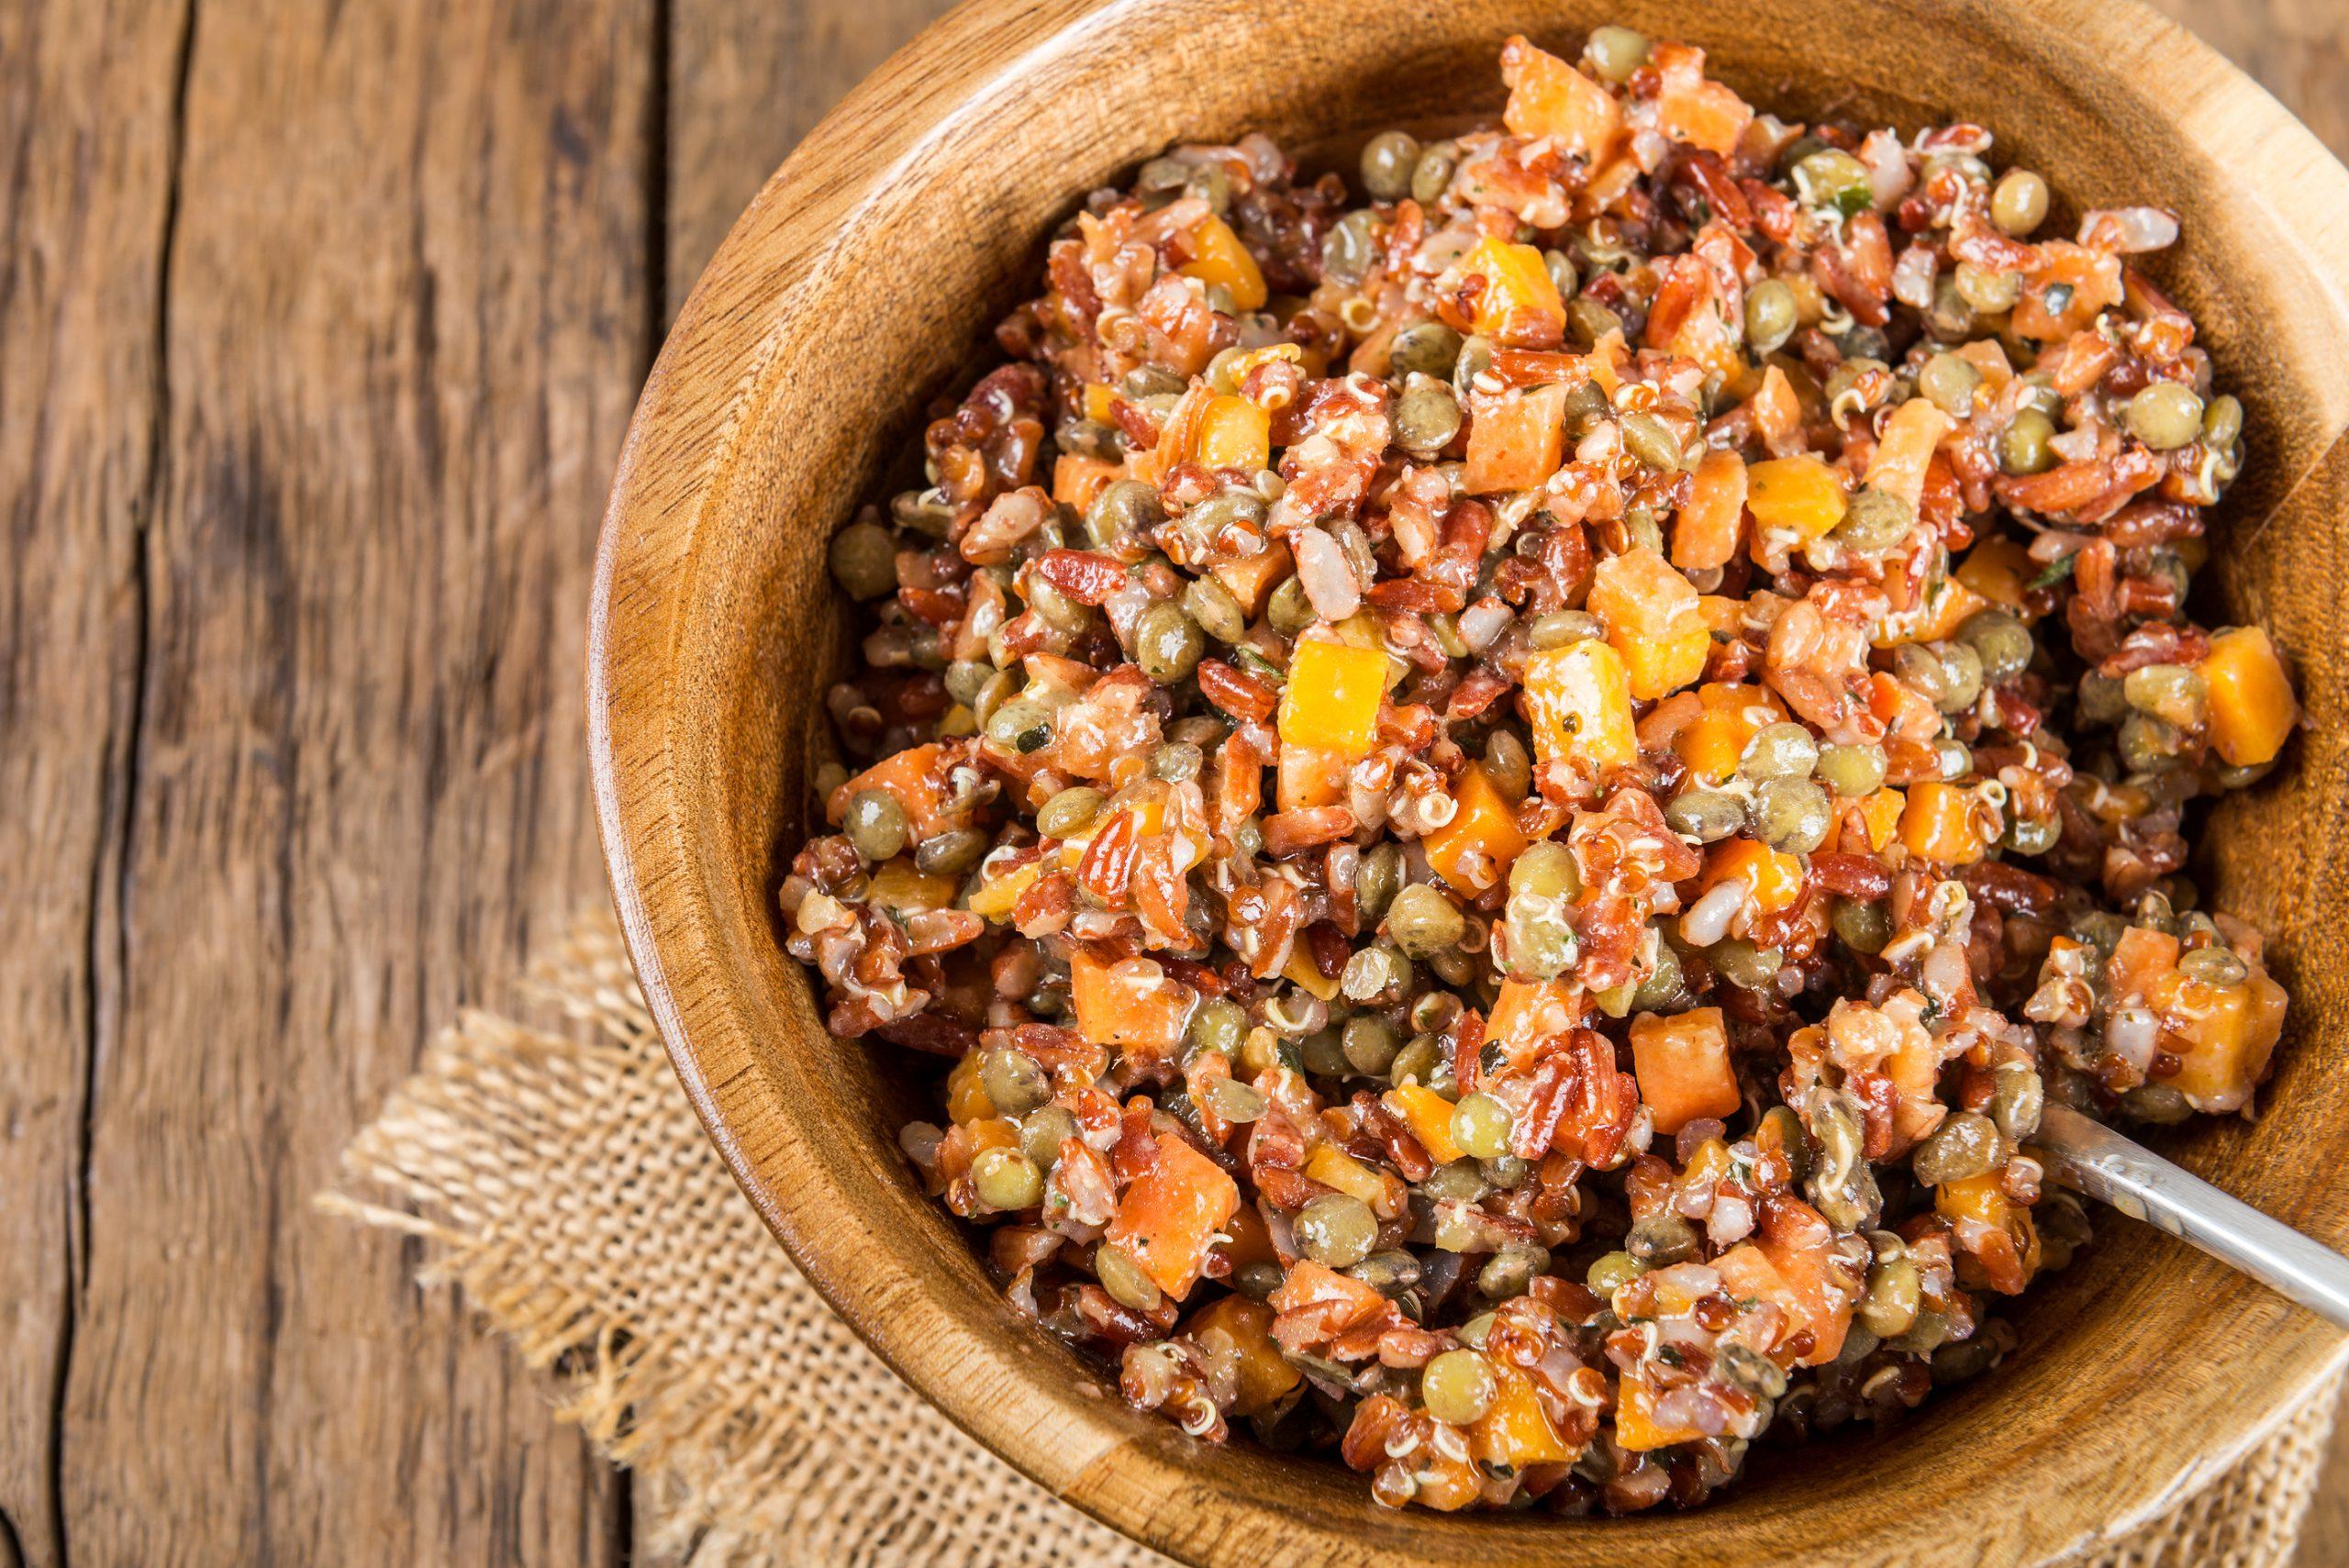 [RECIPE] Warm-roasted butternut squash and quinoa salad with radicchio